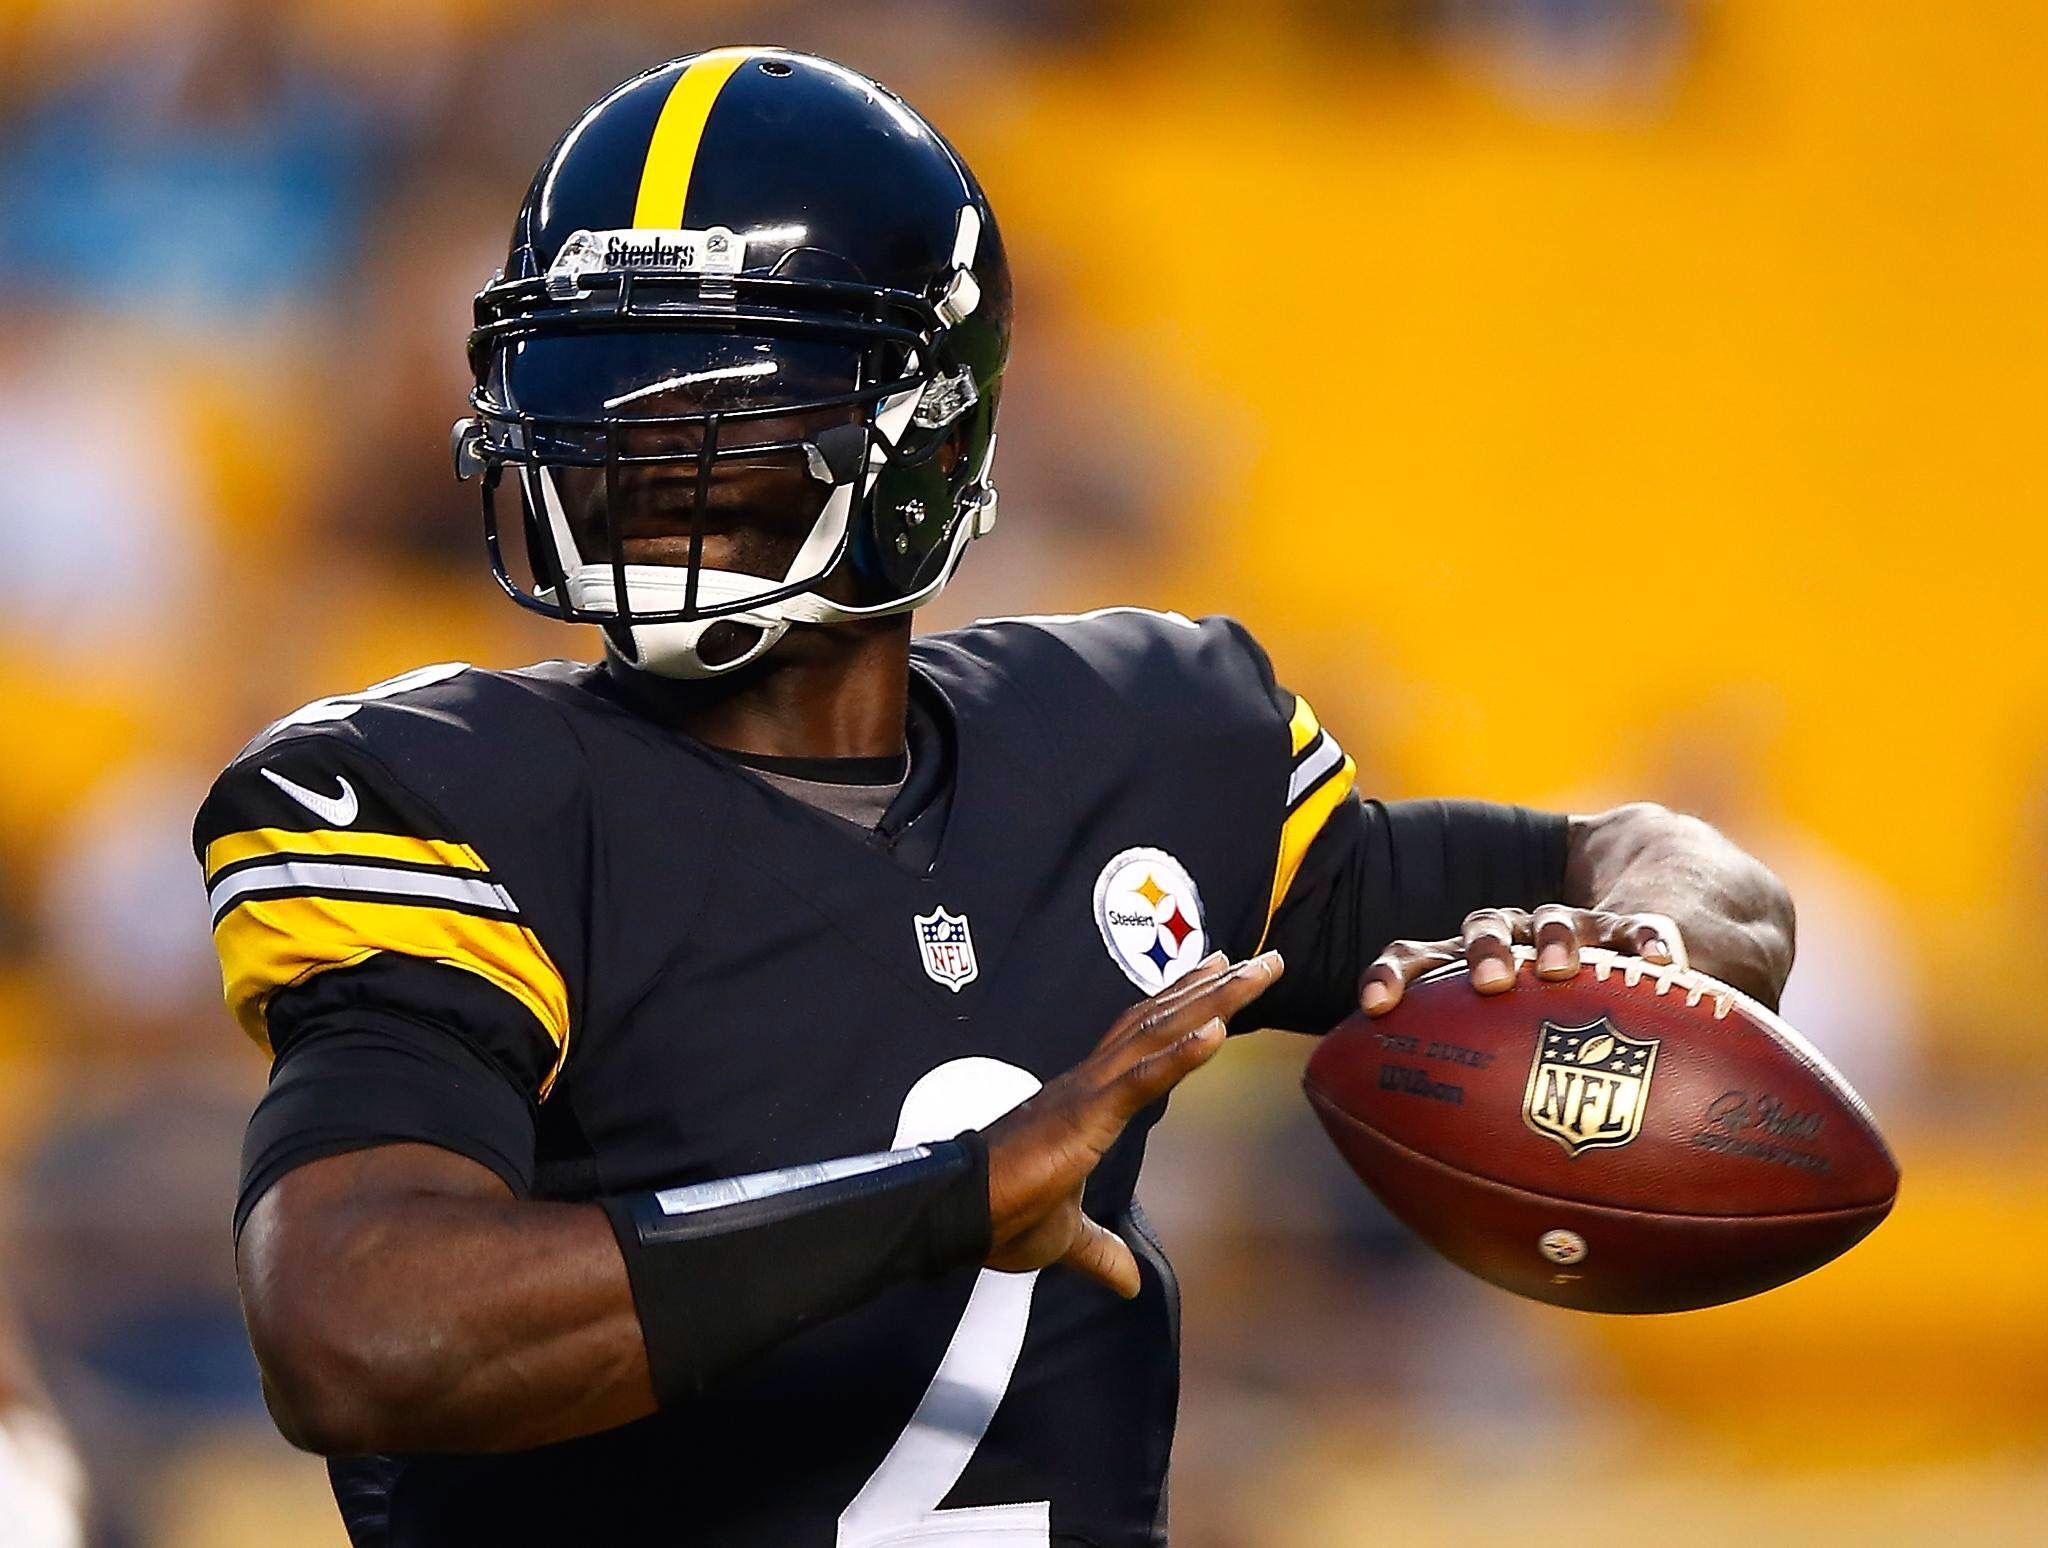 Vick Steelers